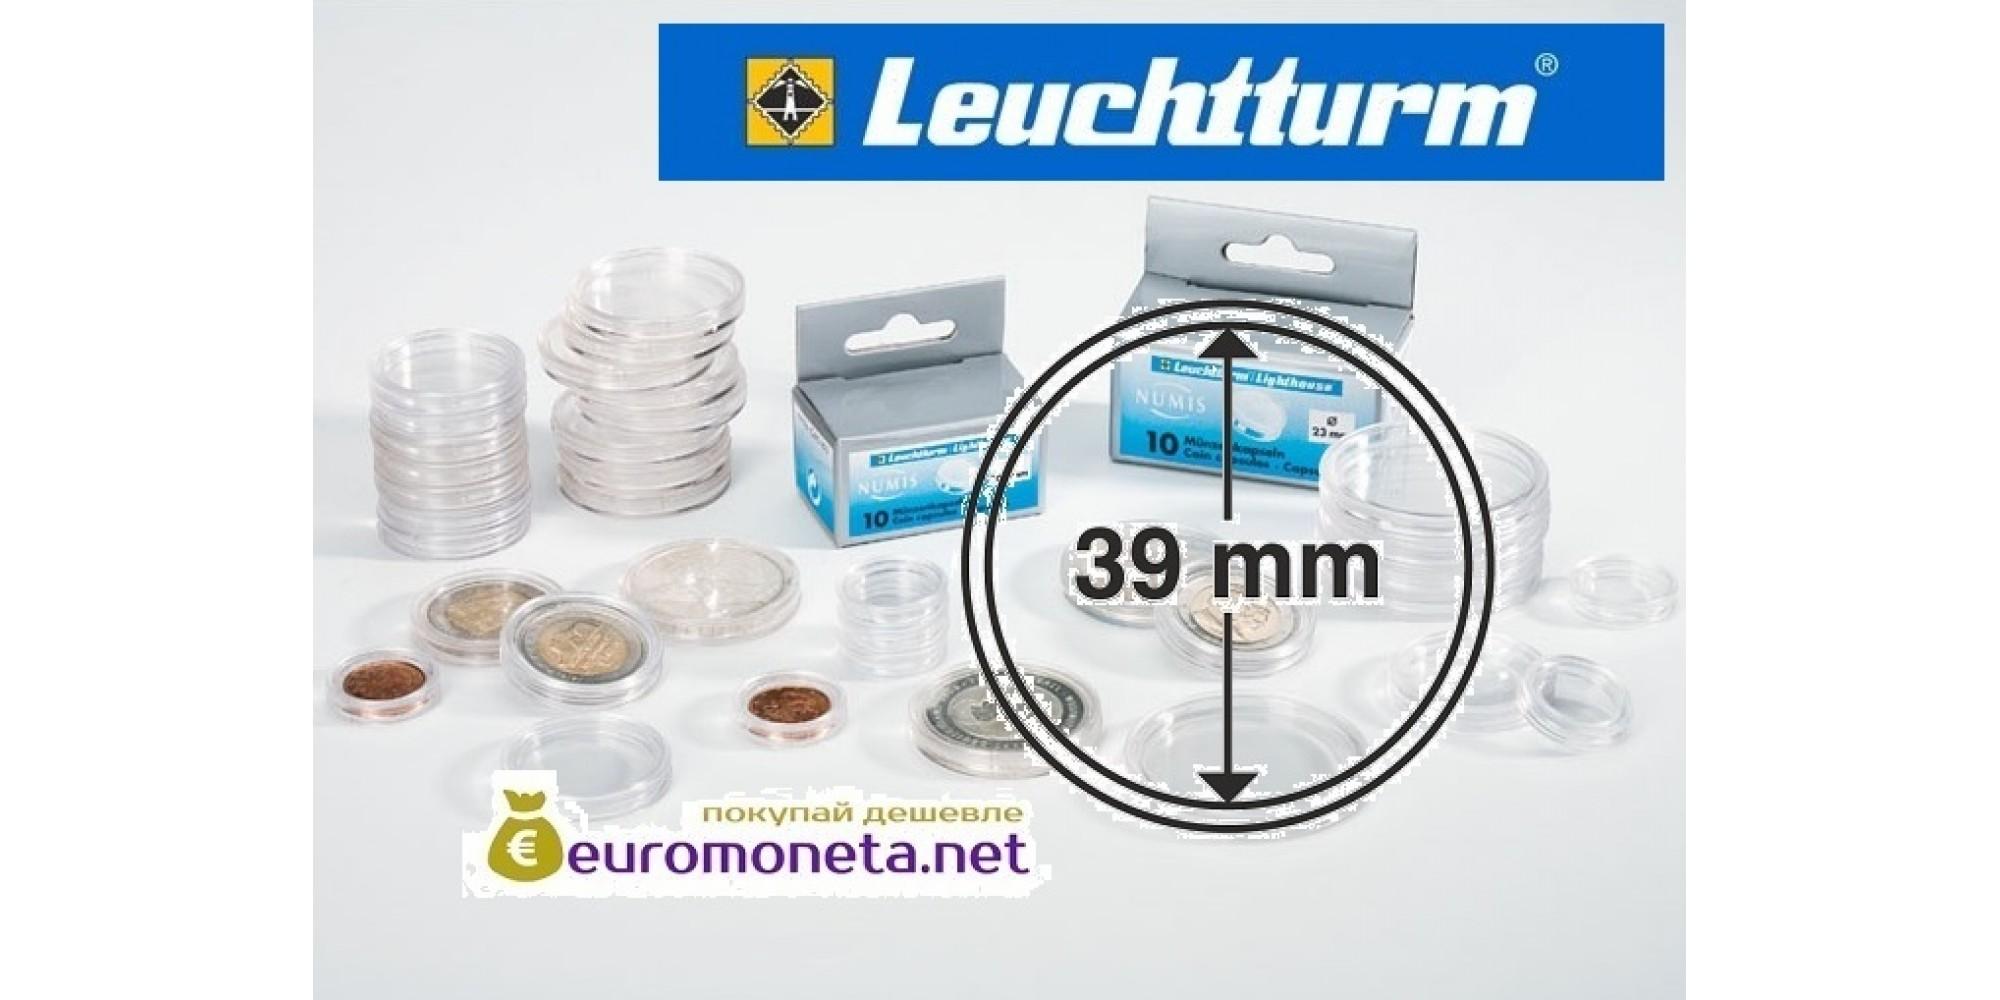 Leuchtturm капсула для хранения монет внутренний диаметр 39 мм, внешний 45 мм, 10 штук